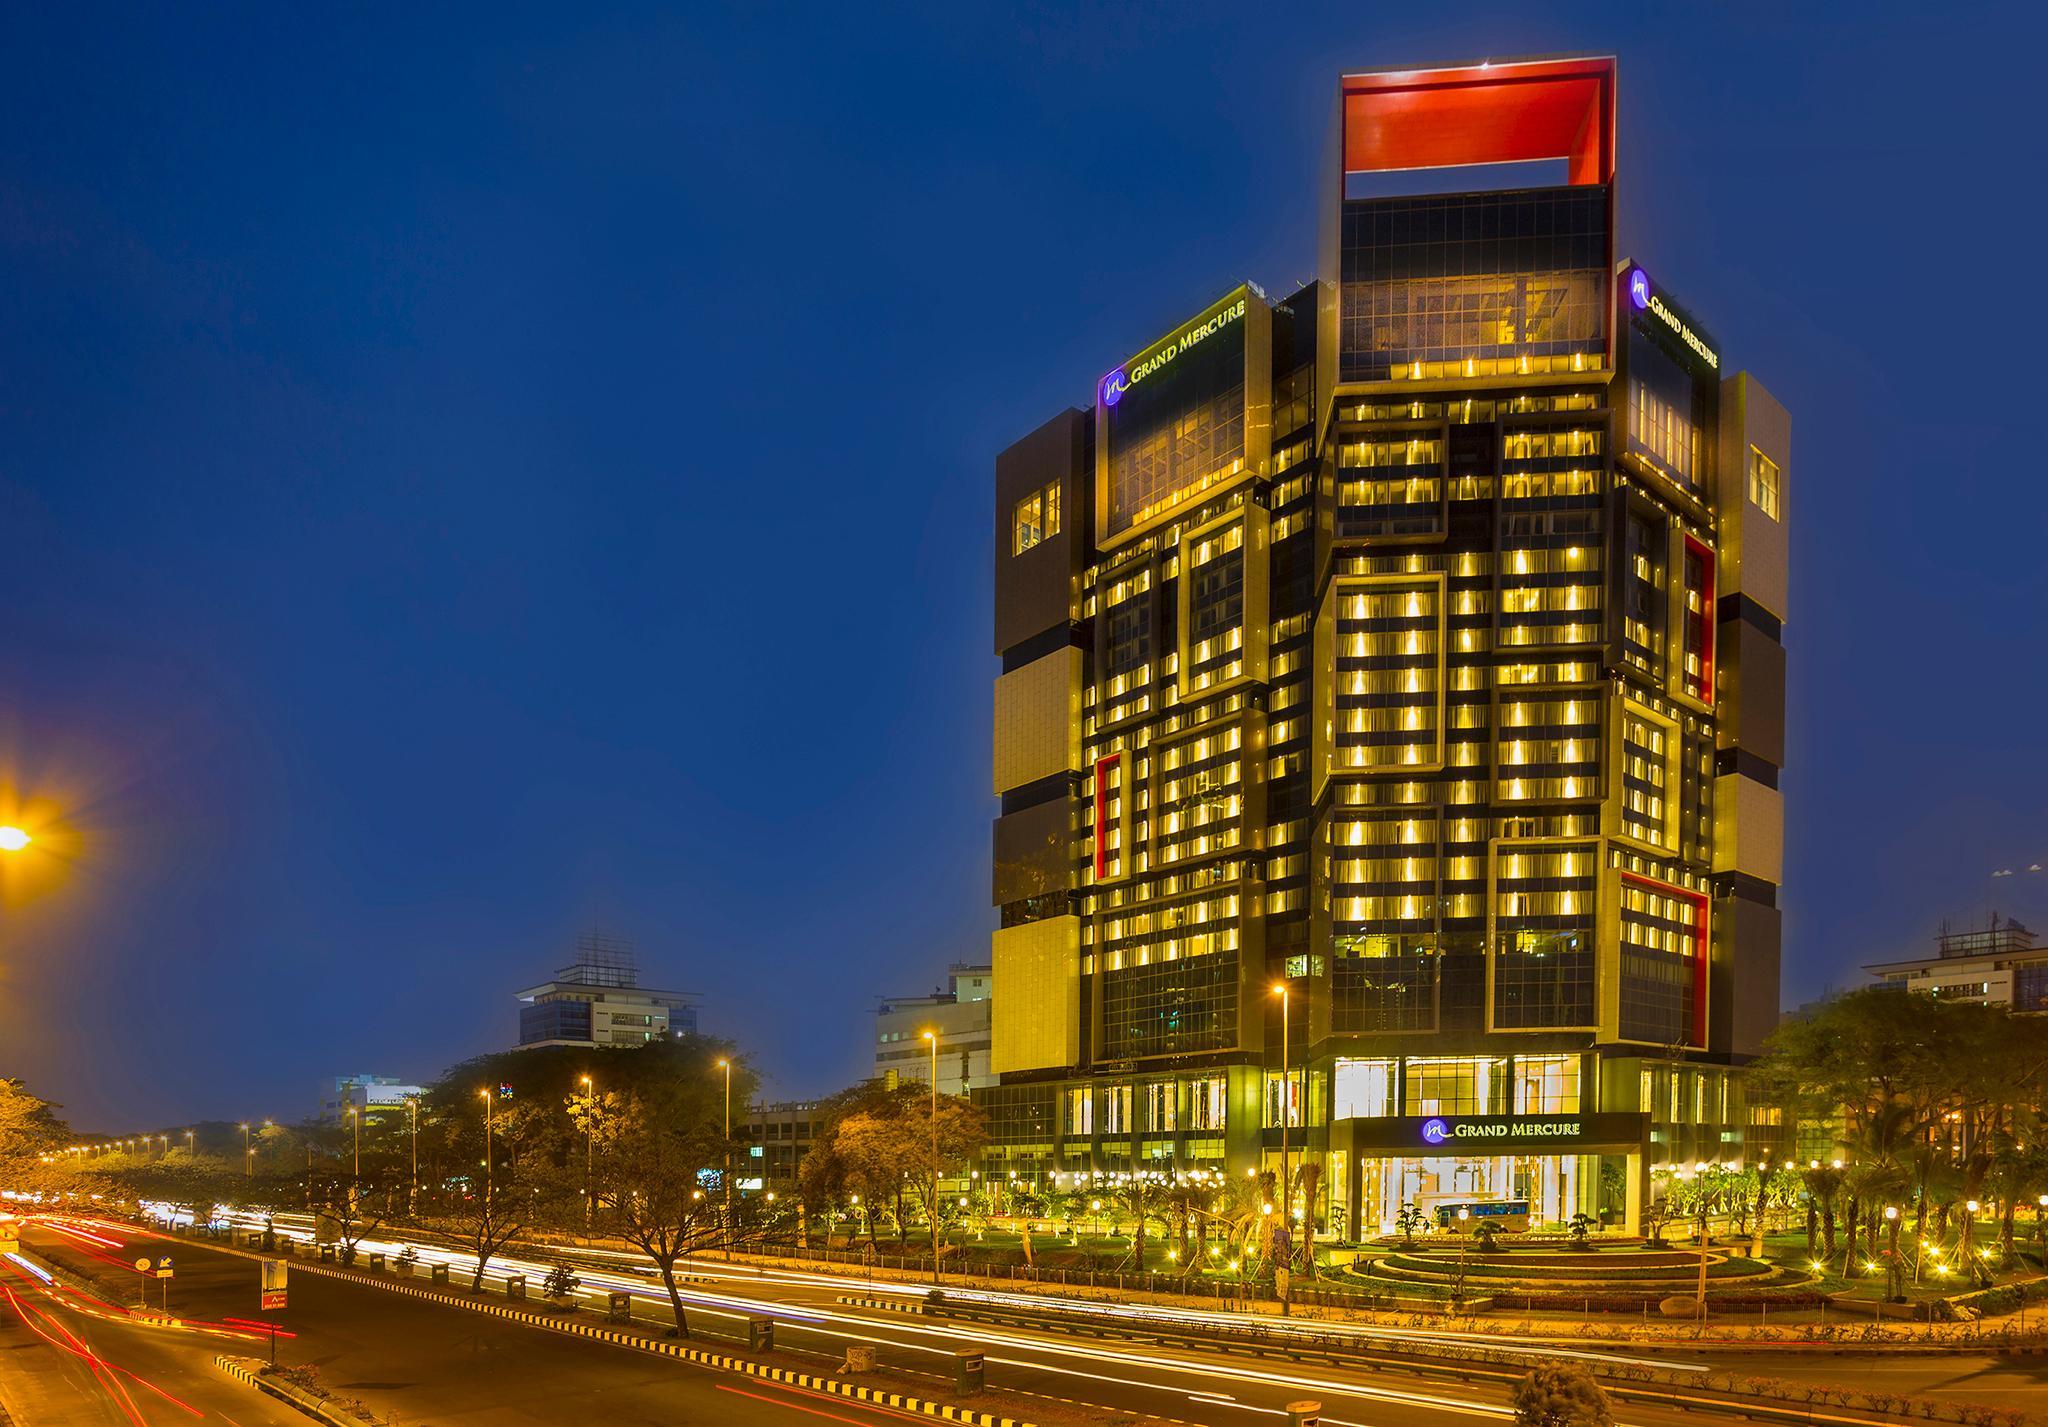 Grand Mercure Jkt Kemayoran, Central Jakarta